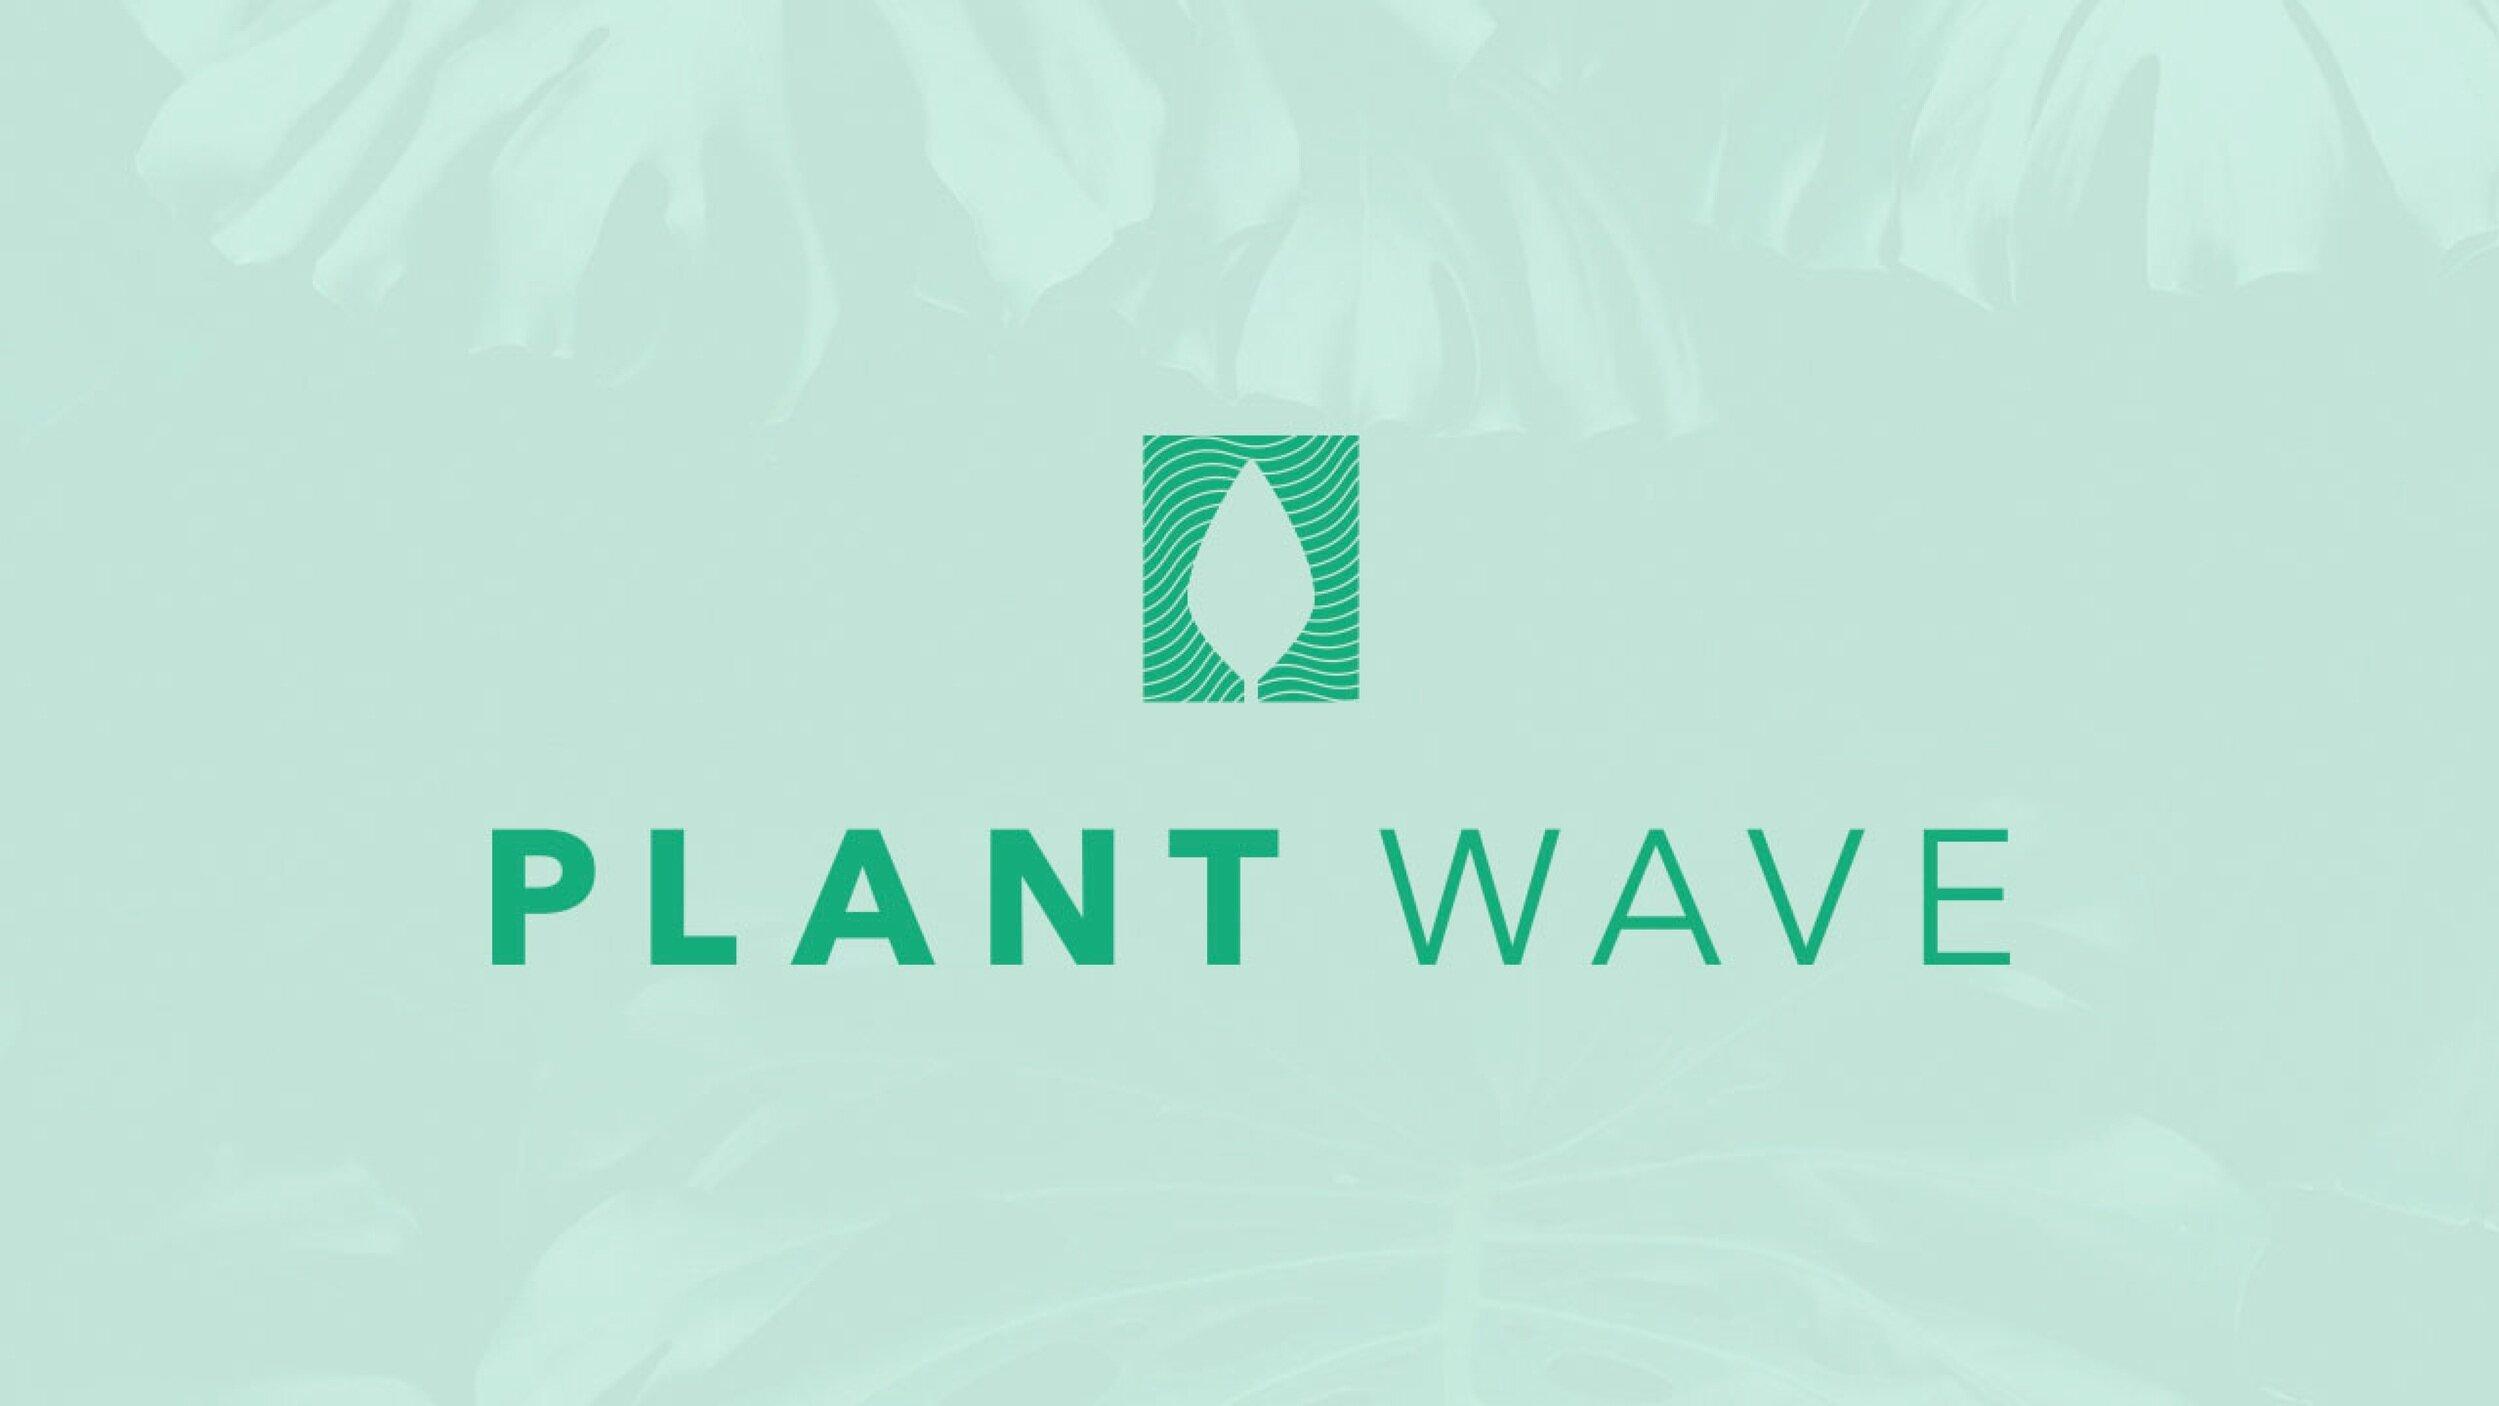 plantwave-light-green-bg.jpg